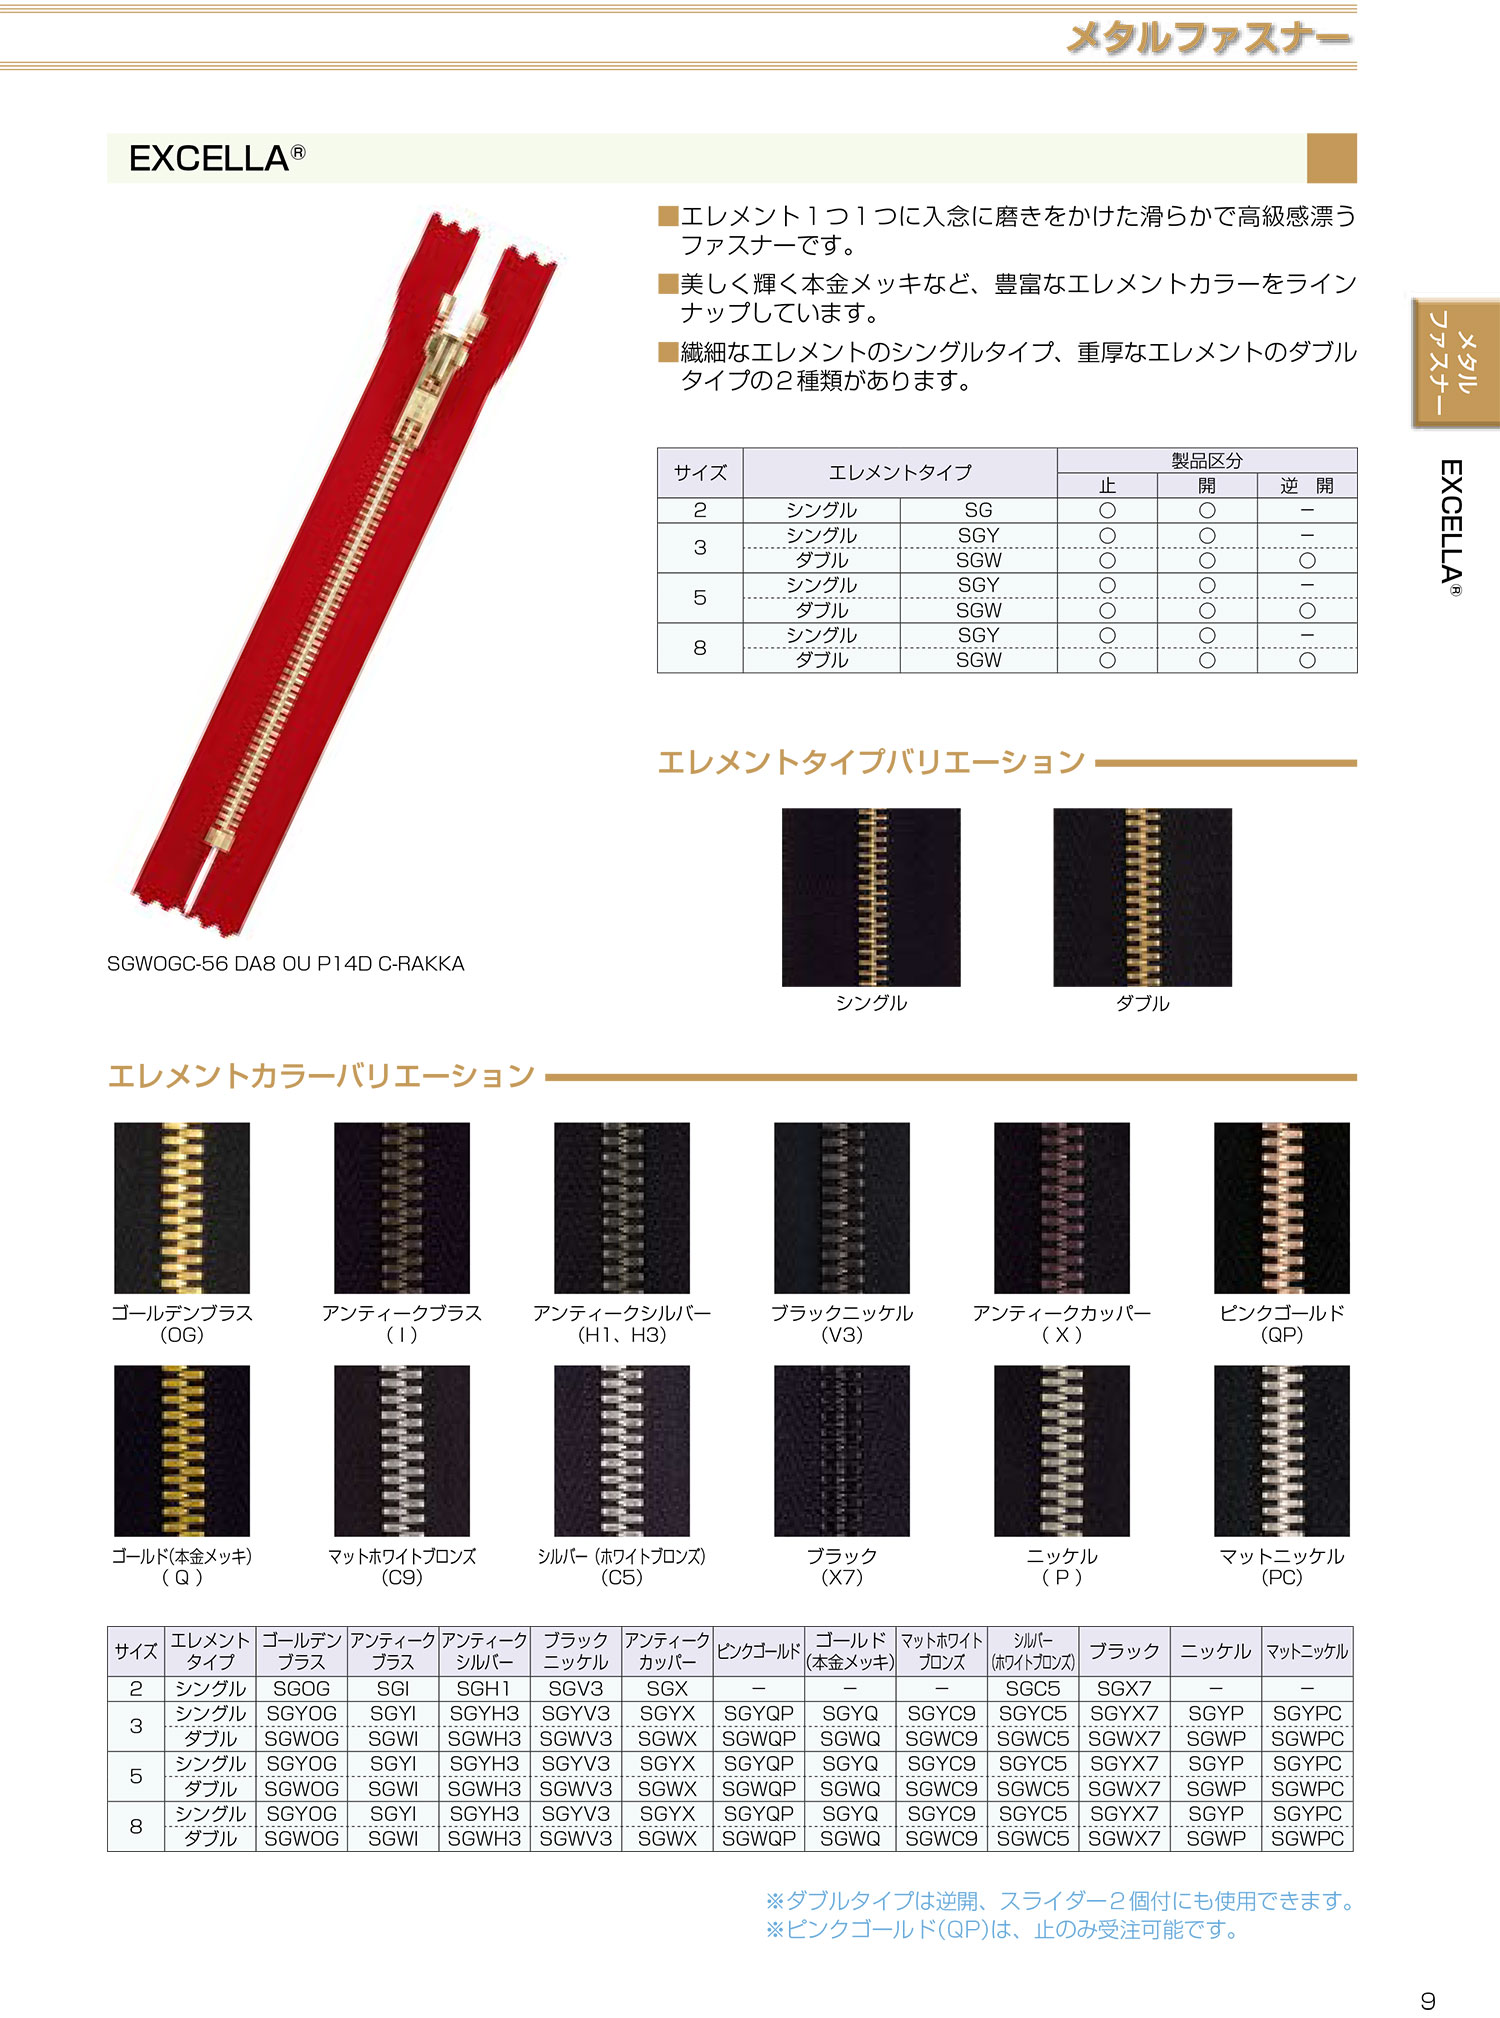 3SGYIOR エクセラ 3サイズ アンティークブラス オープン シングル[ファスナー] YKK/オークラ商事 - ApparelX アパレル資材卸通販